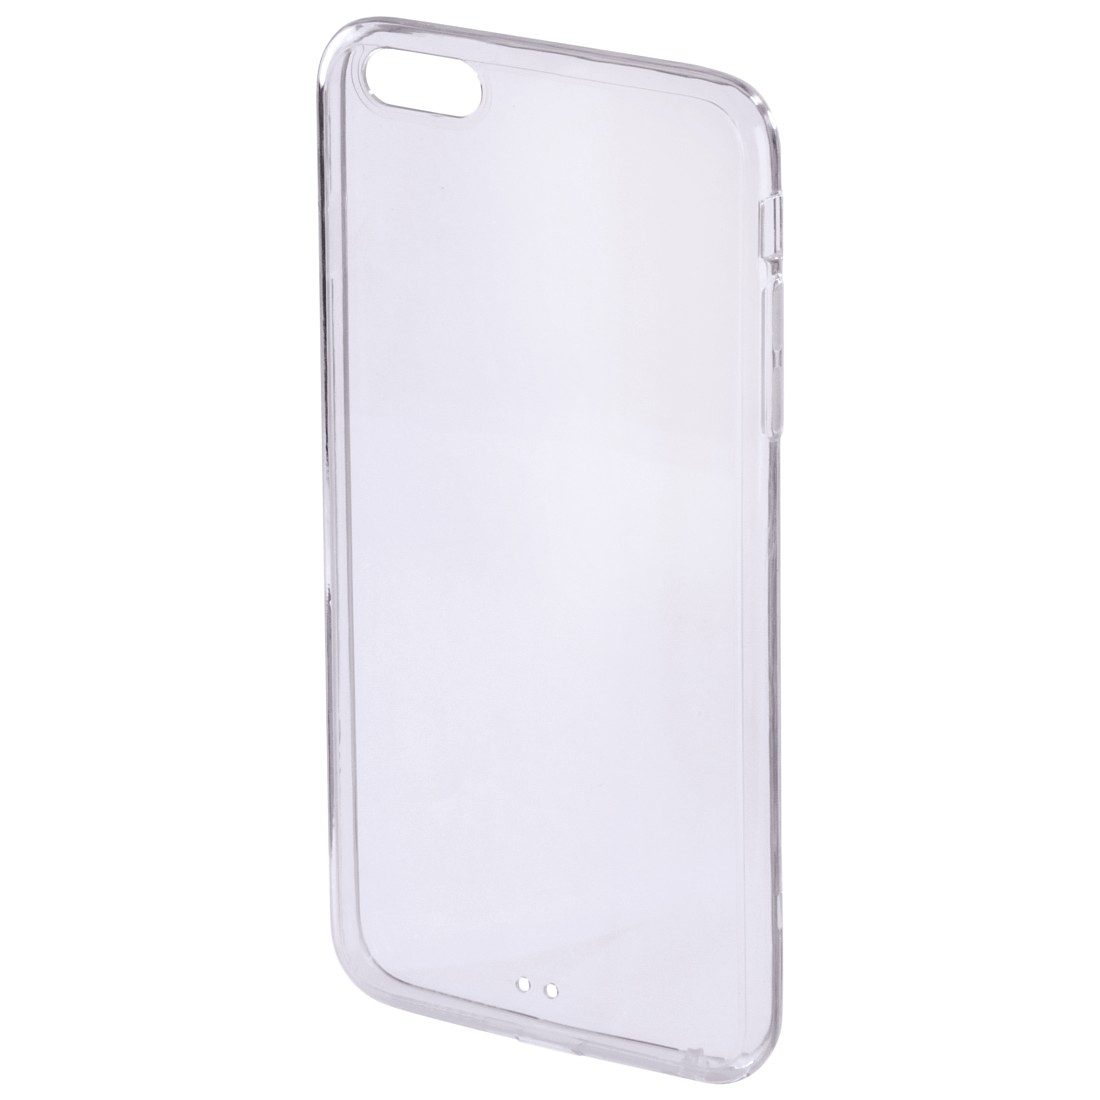 Hama Cover Frame für Apple iPhone 6/6s, Weiß